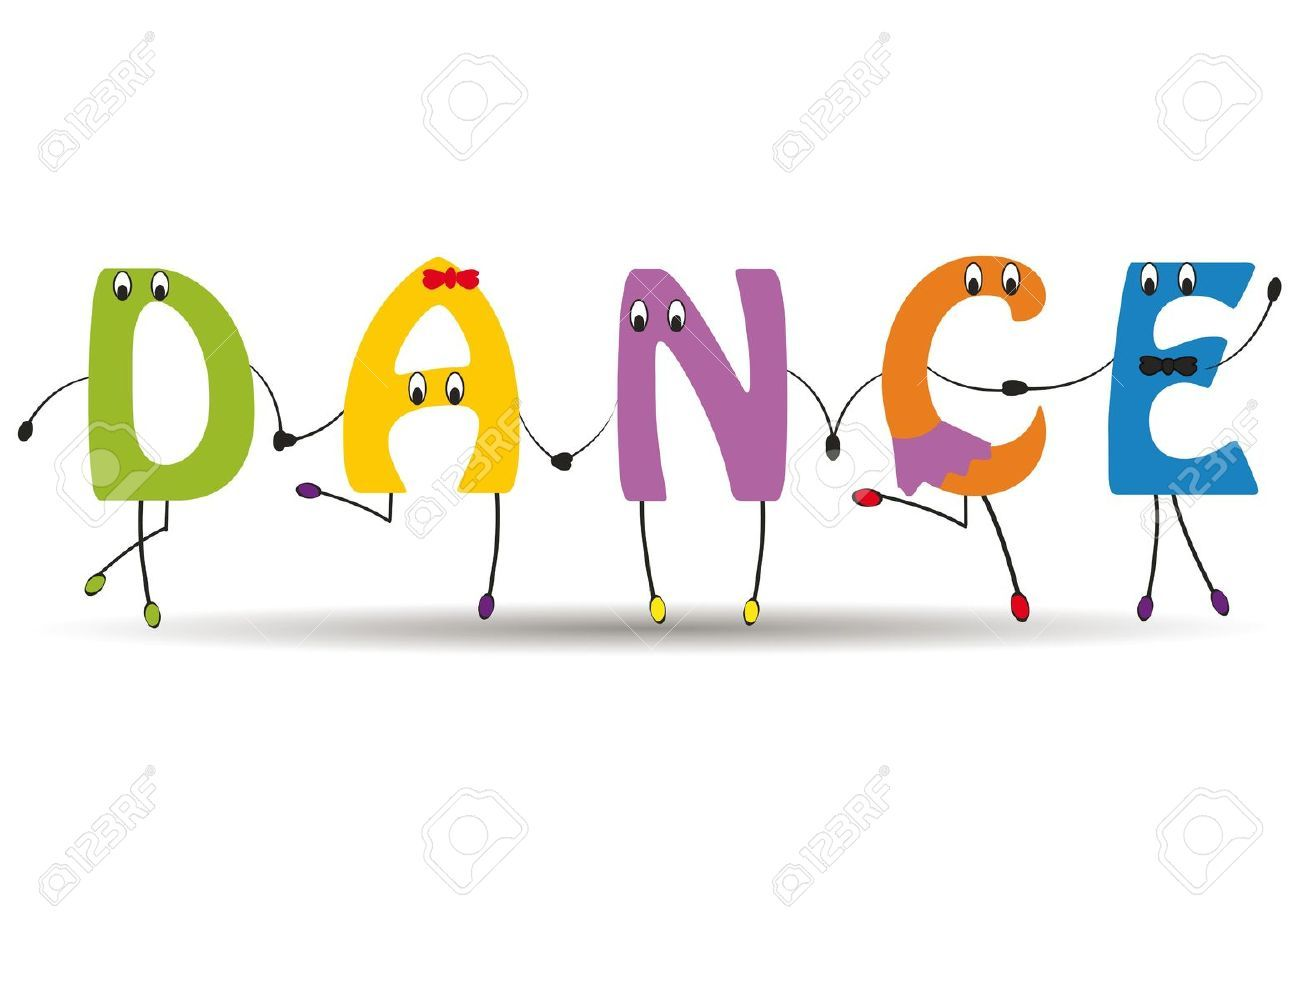 Freeze Dance Preschool Lesson Plan.